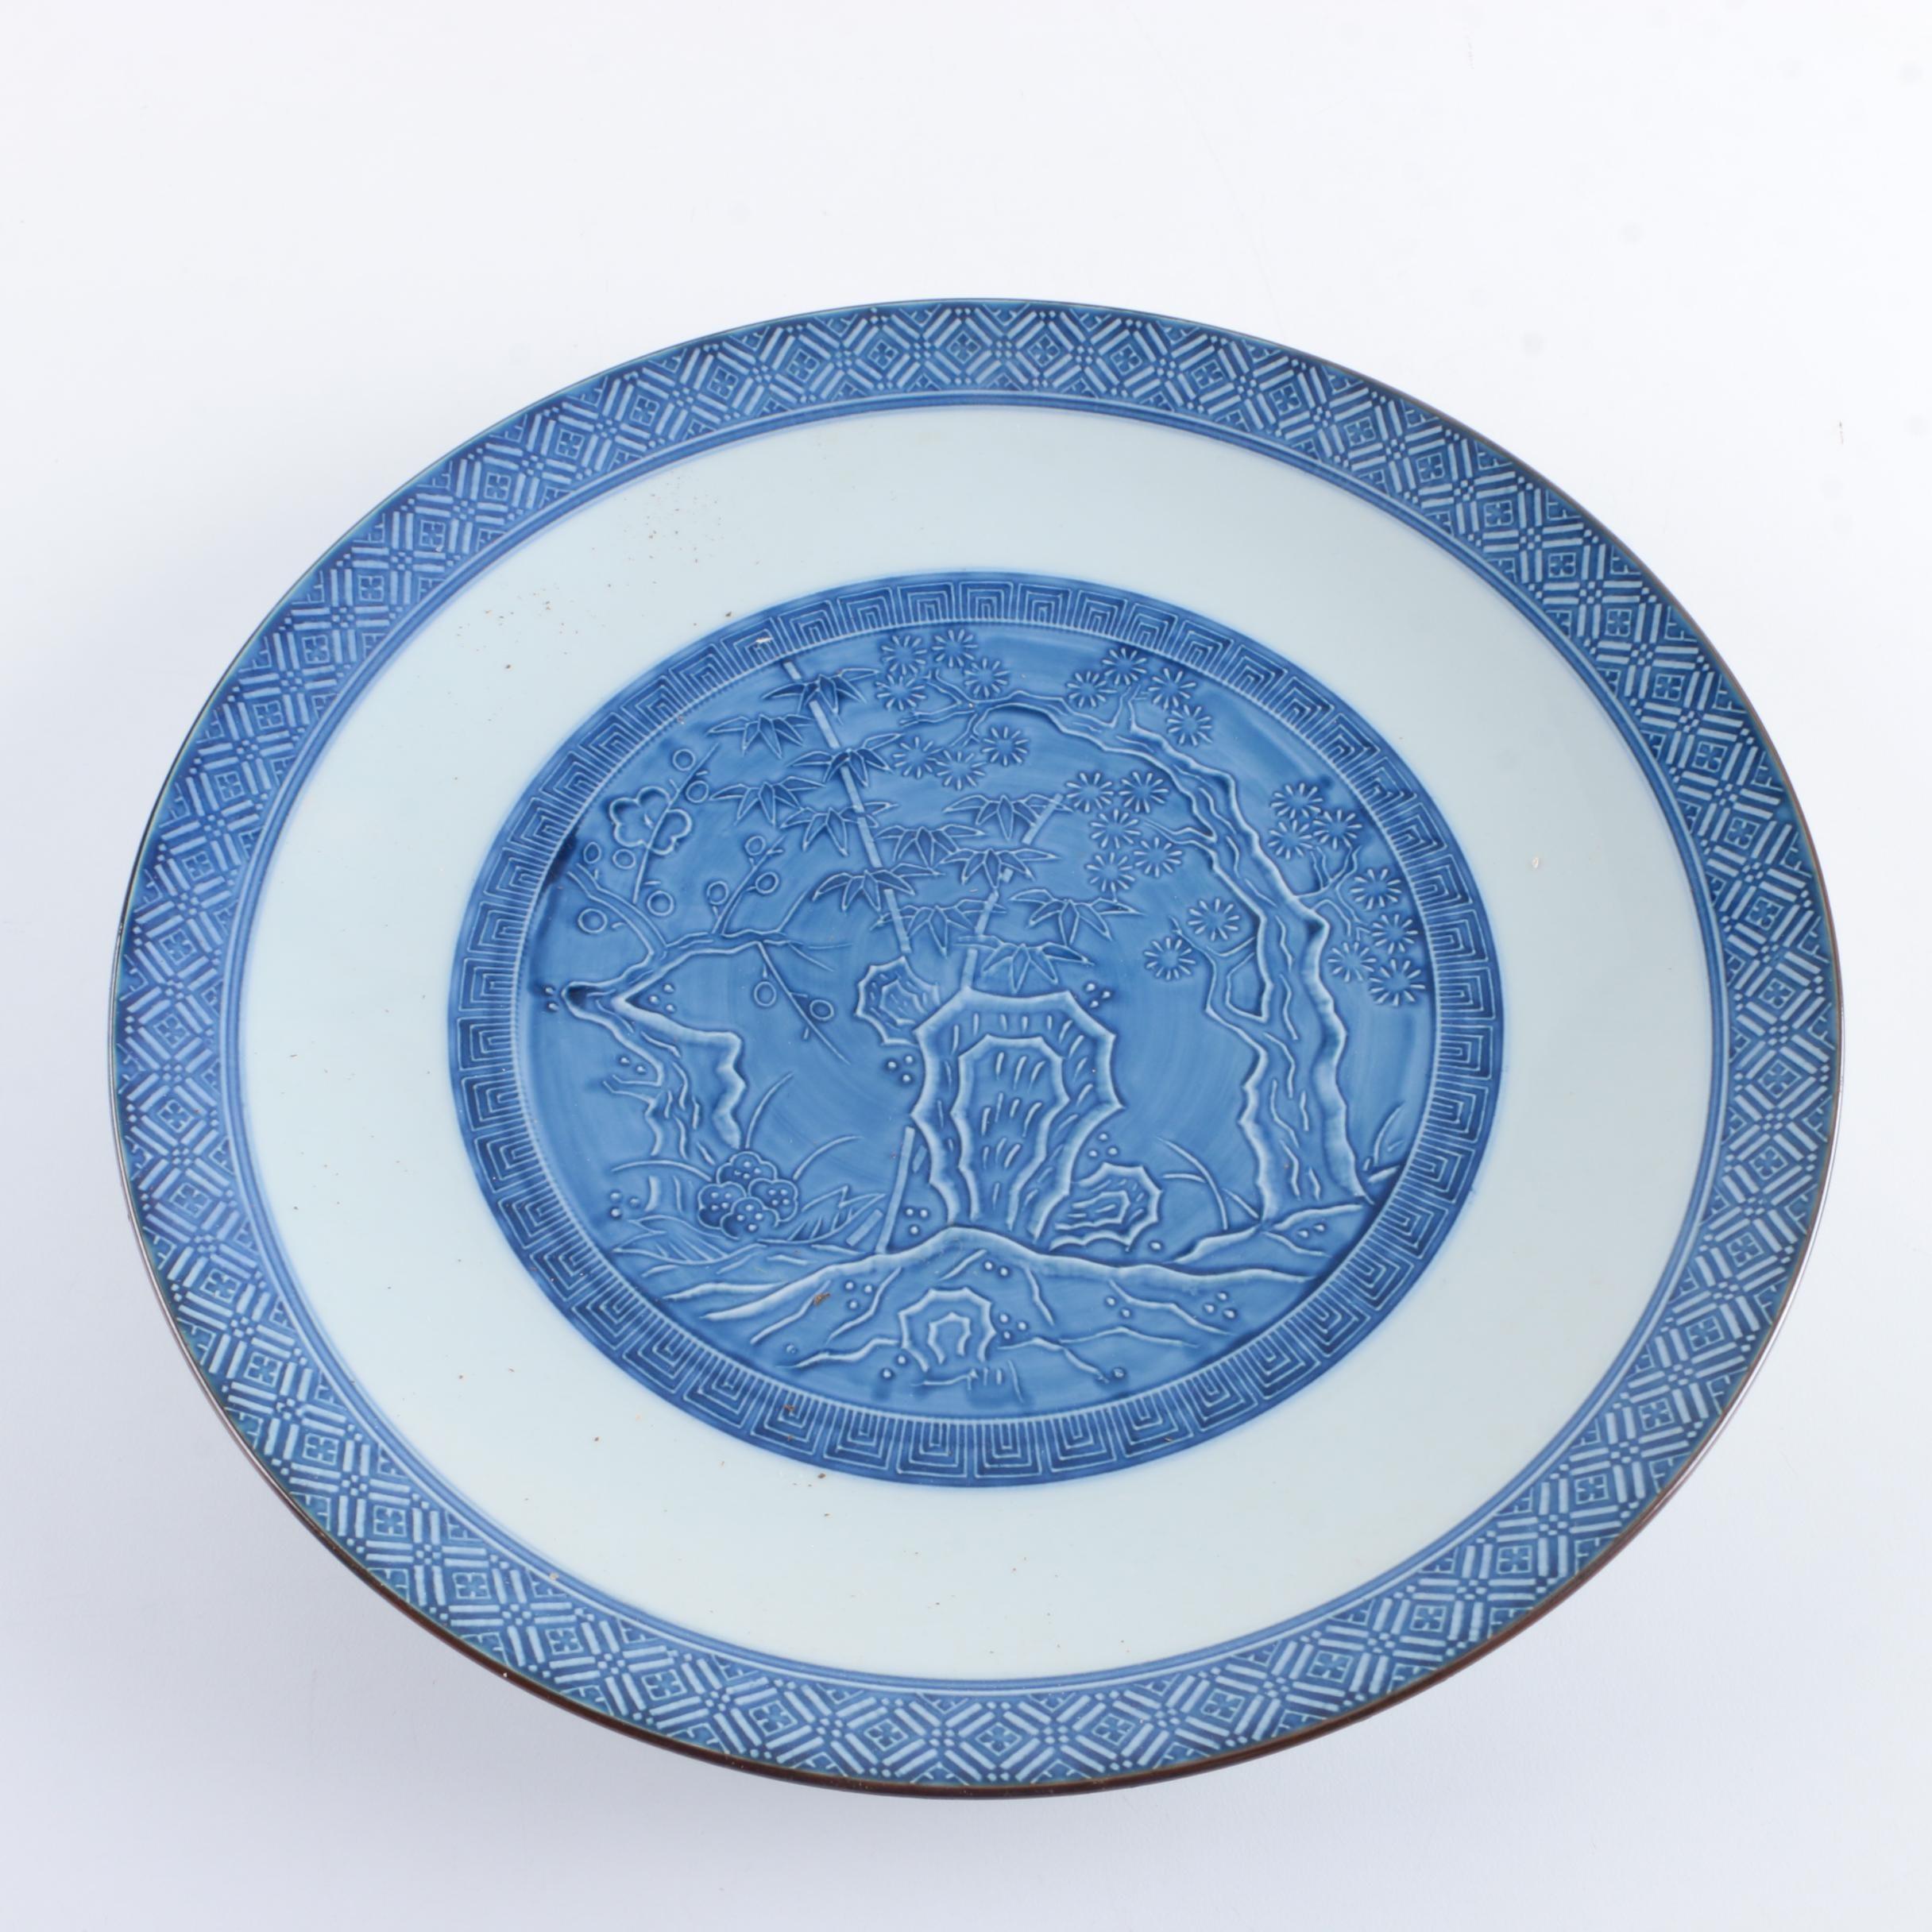 Japanese Decorative Serving Platter